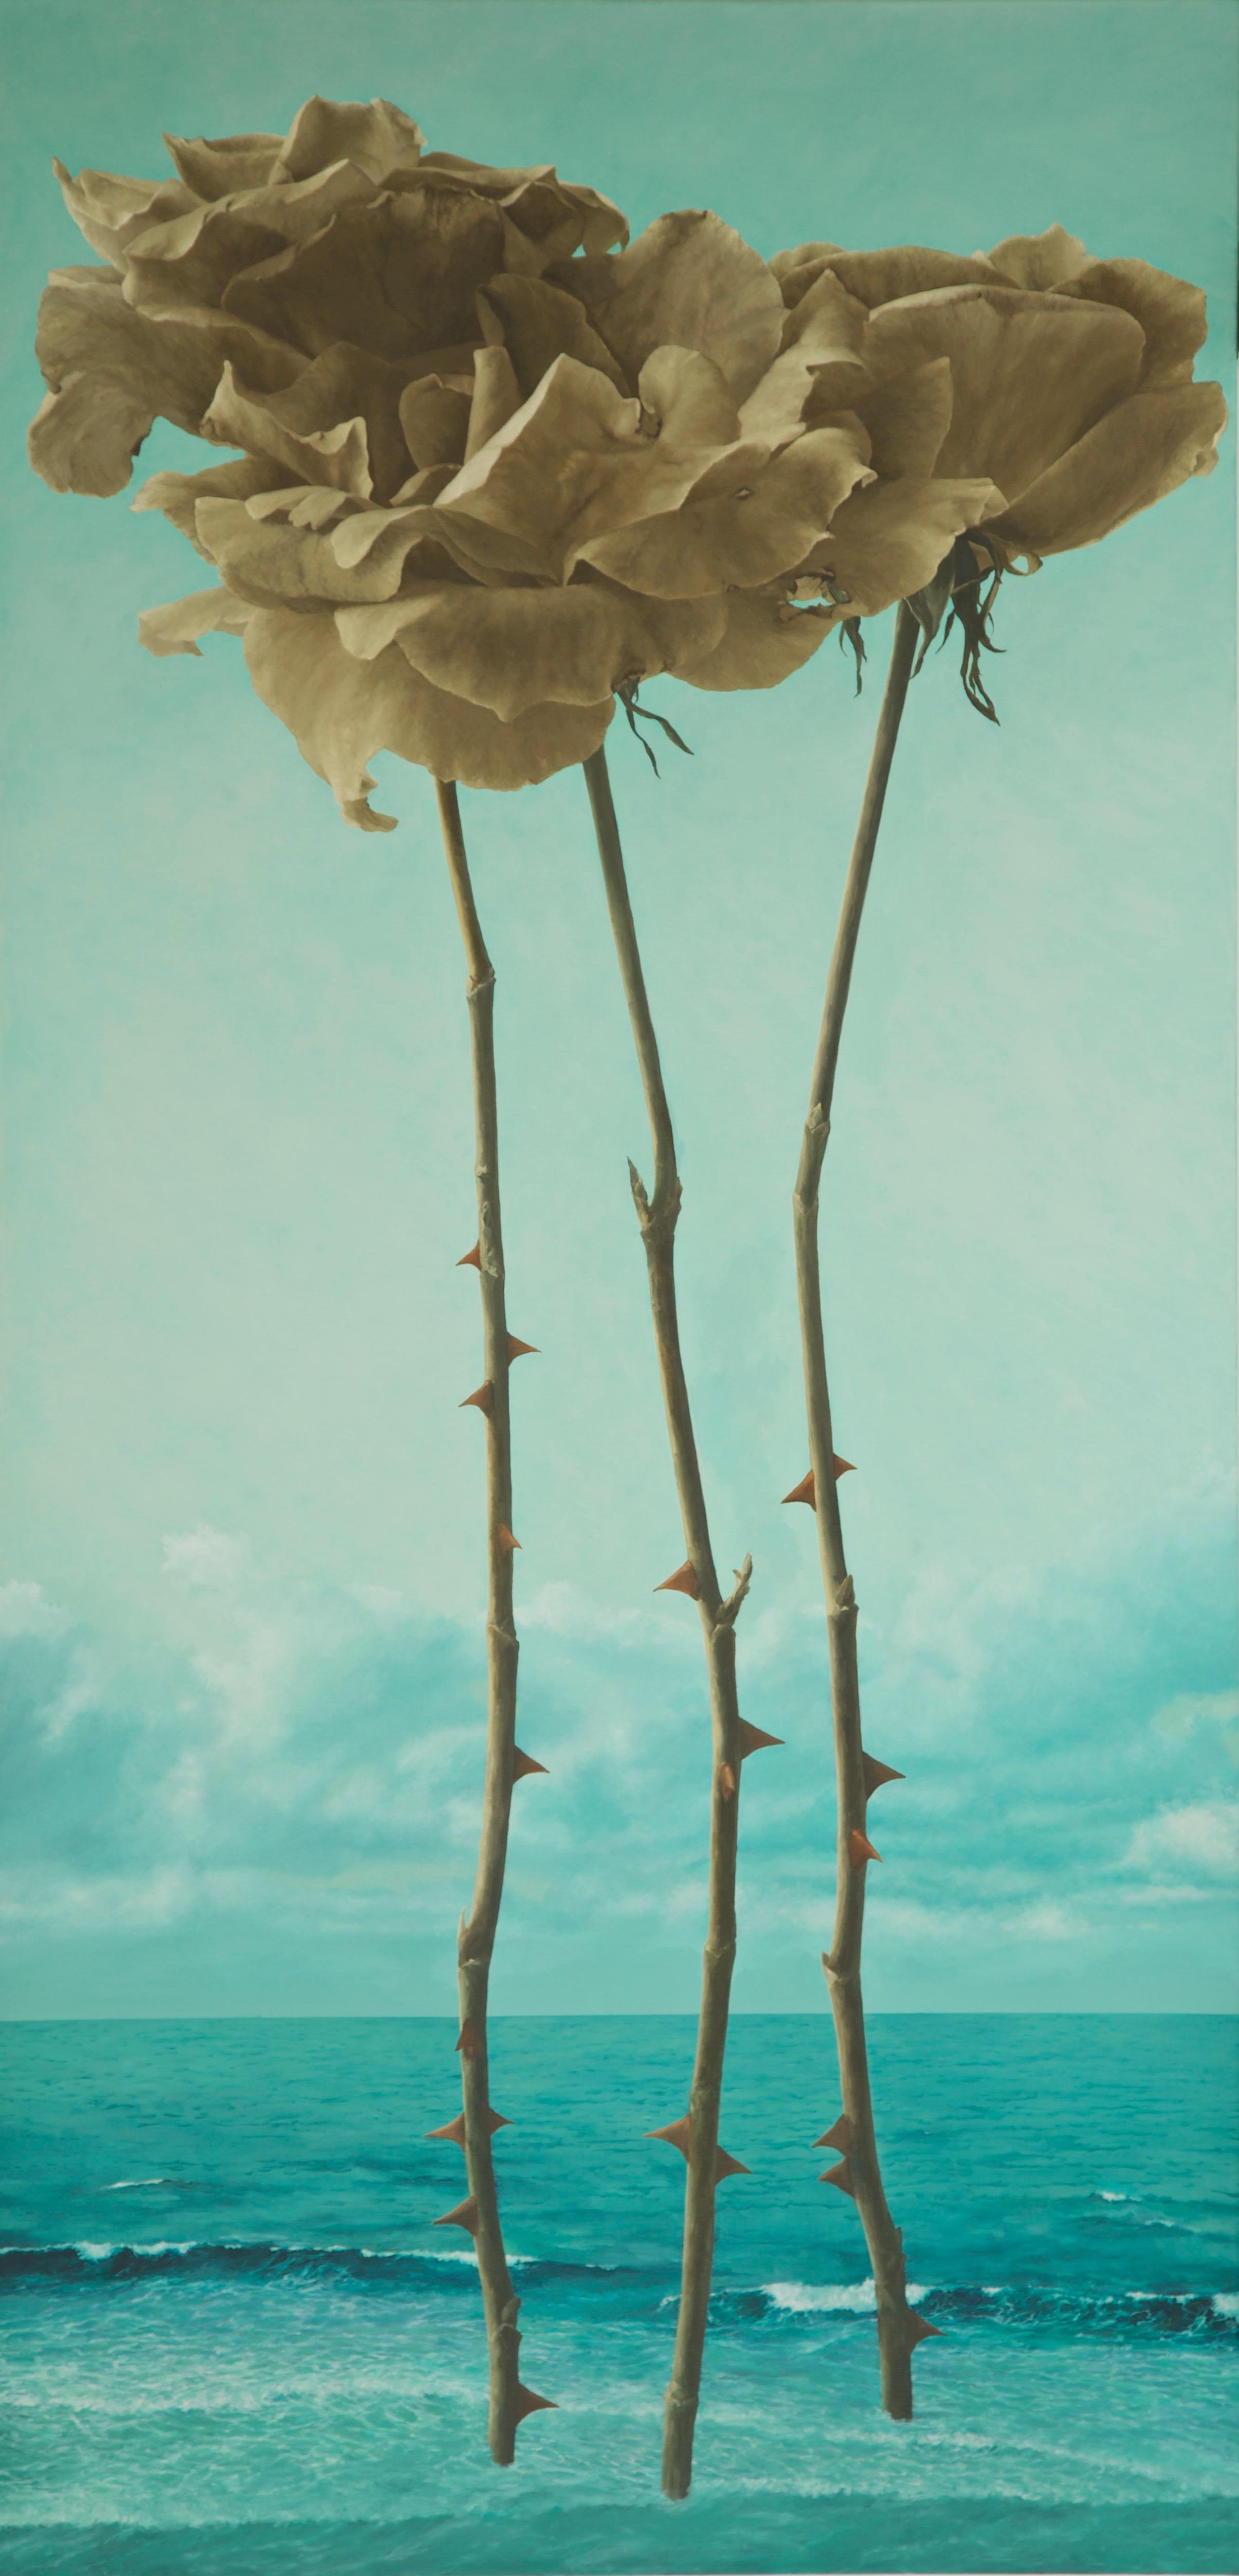 greenish sky and sea, sepia roses